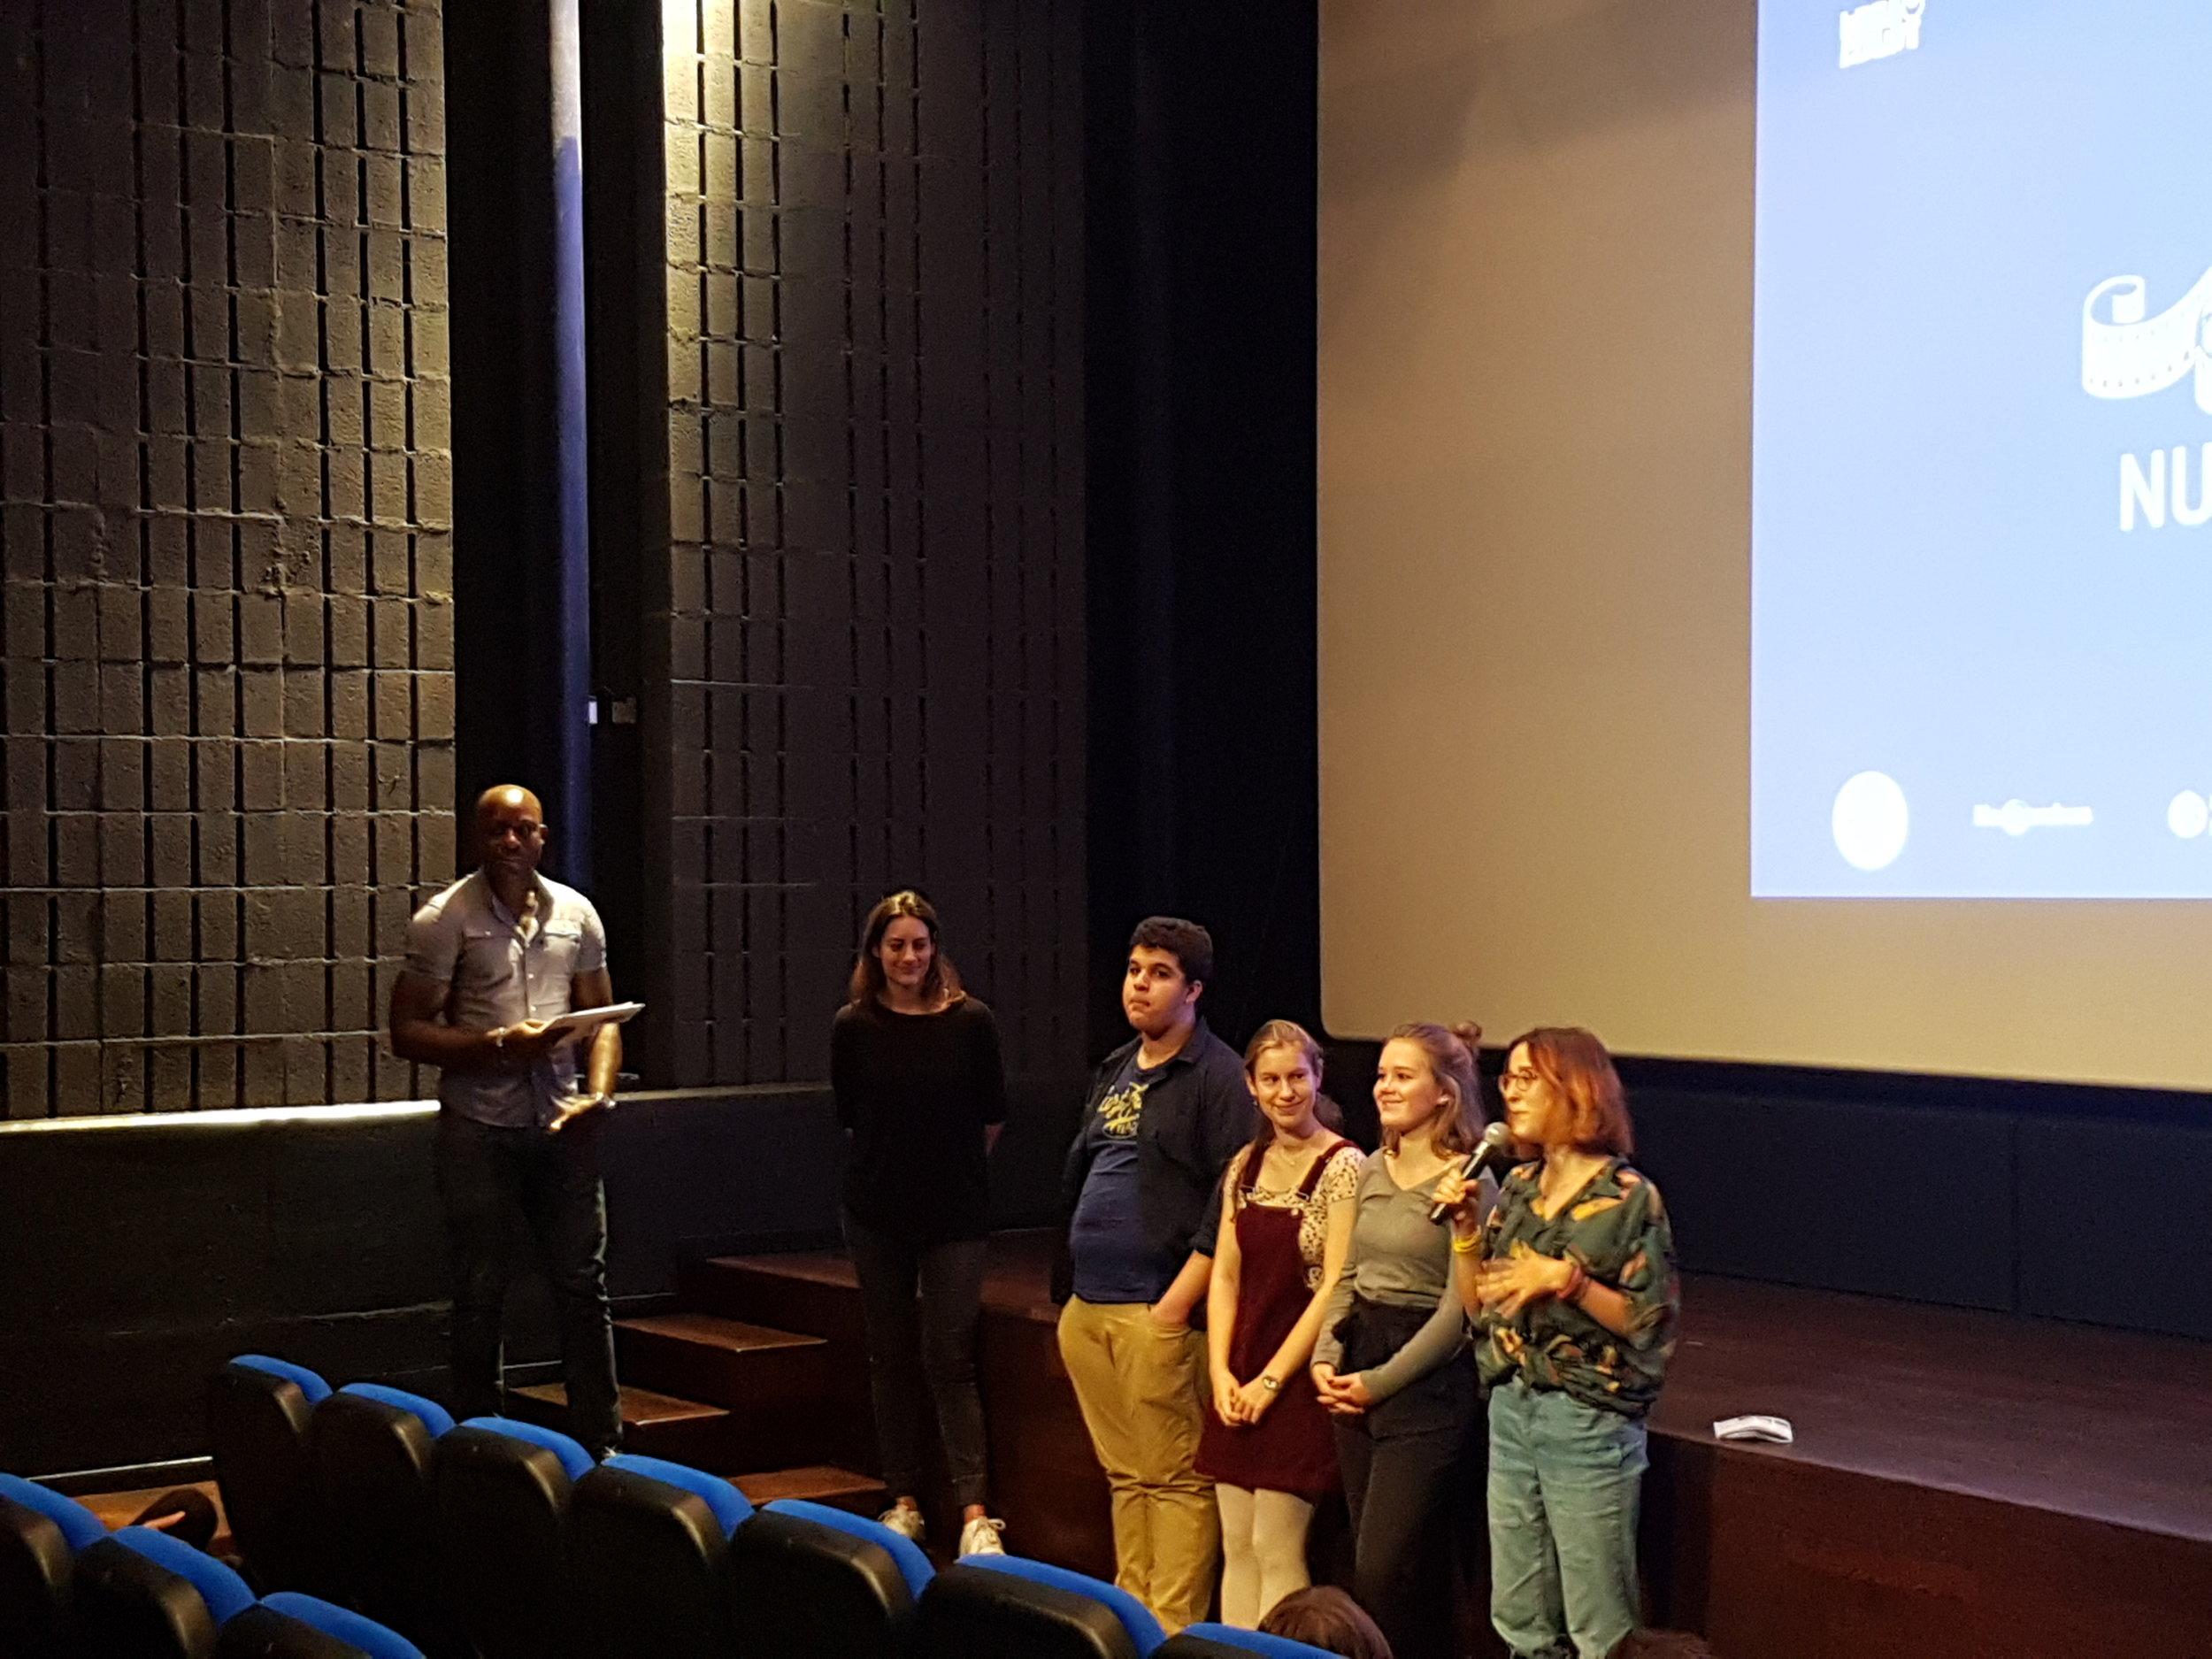 NDC18_2018-09-21_Geneve_Jury-des-jeunes_8.jpg